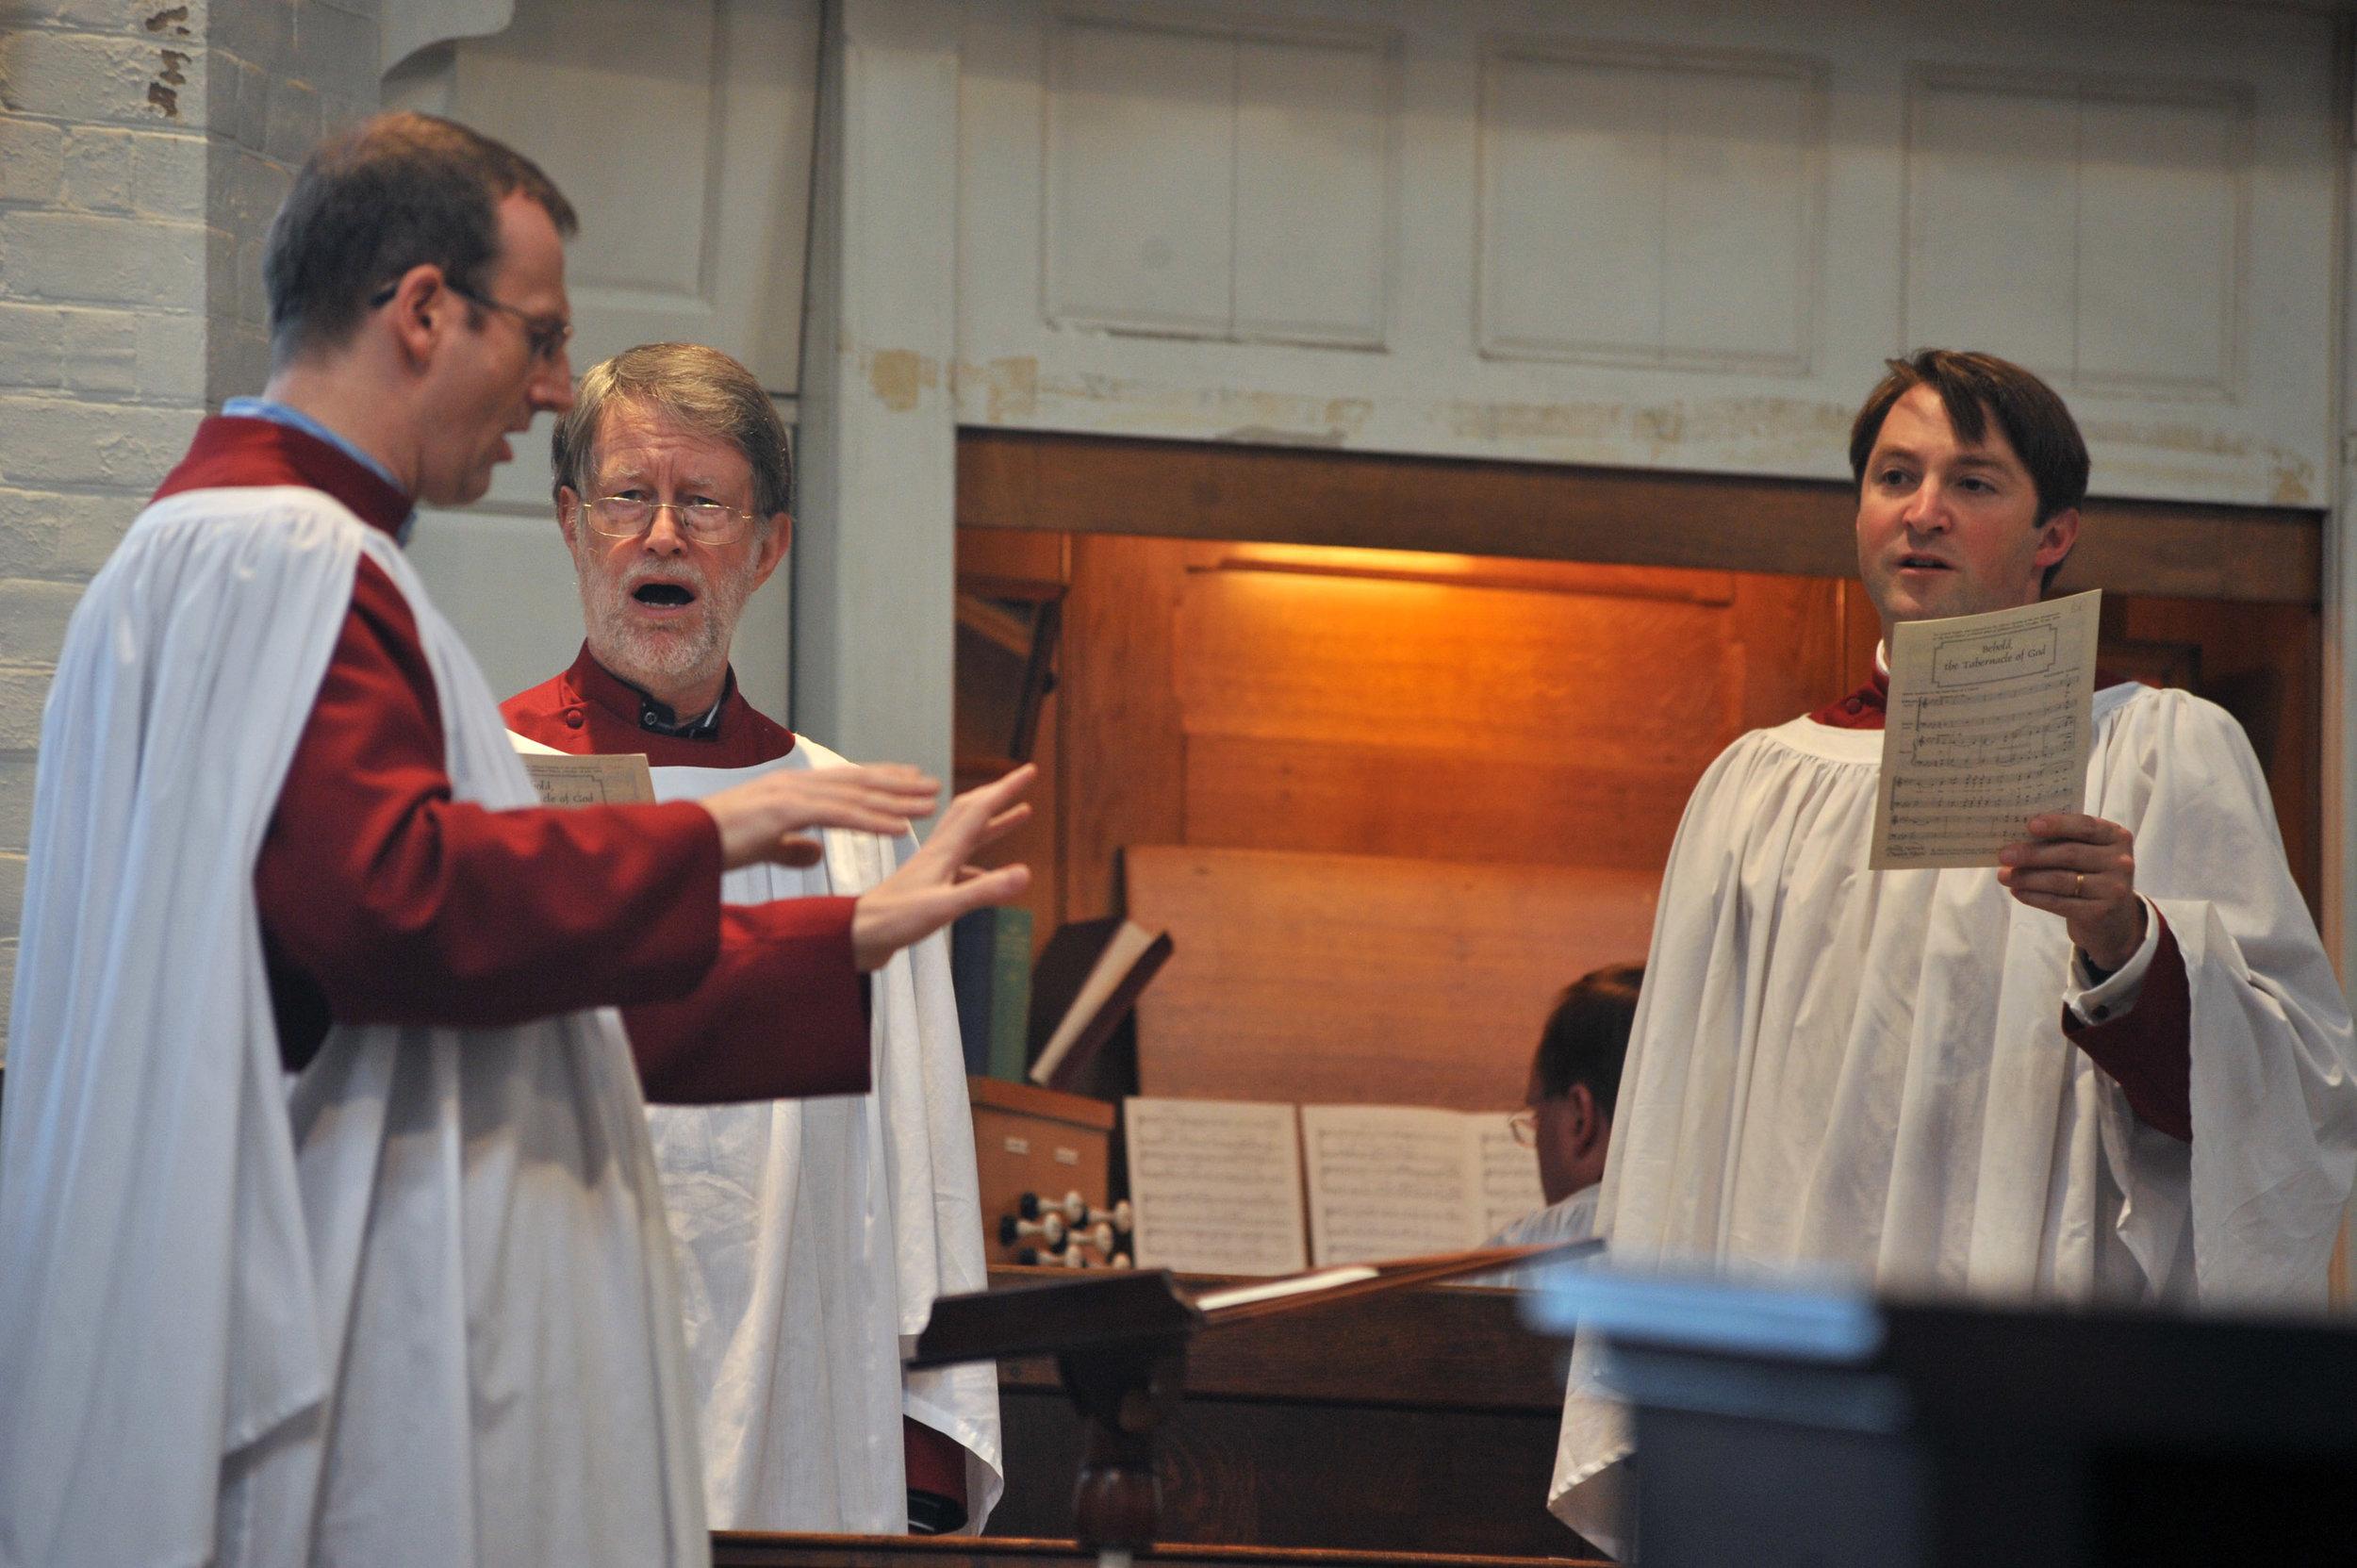 Choral Scholarships